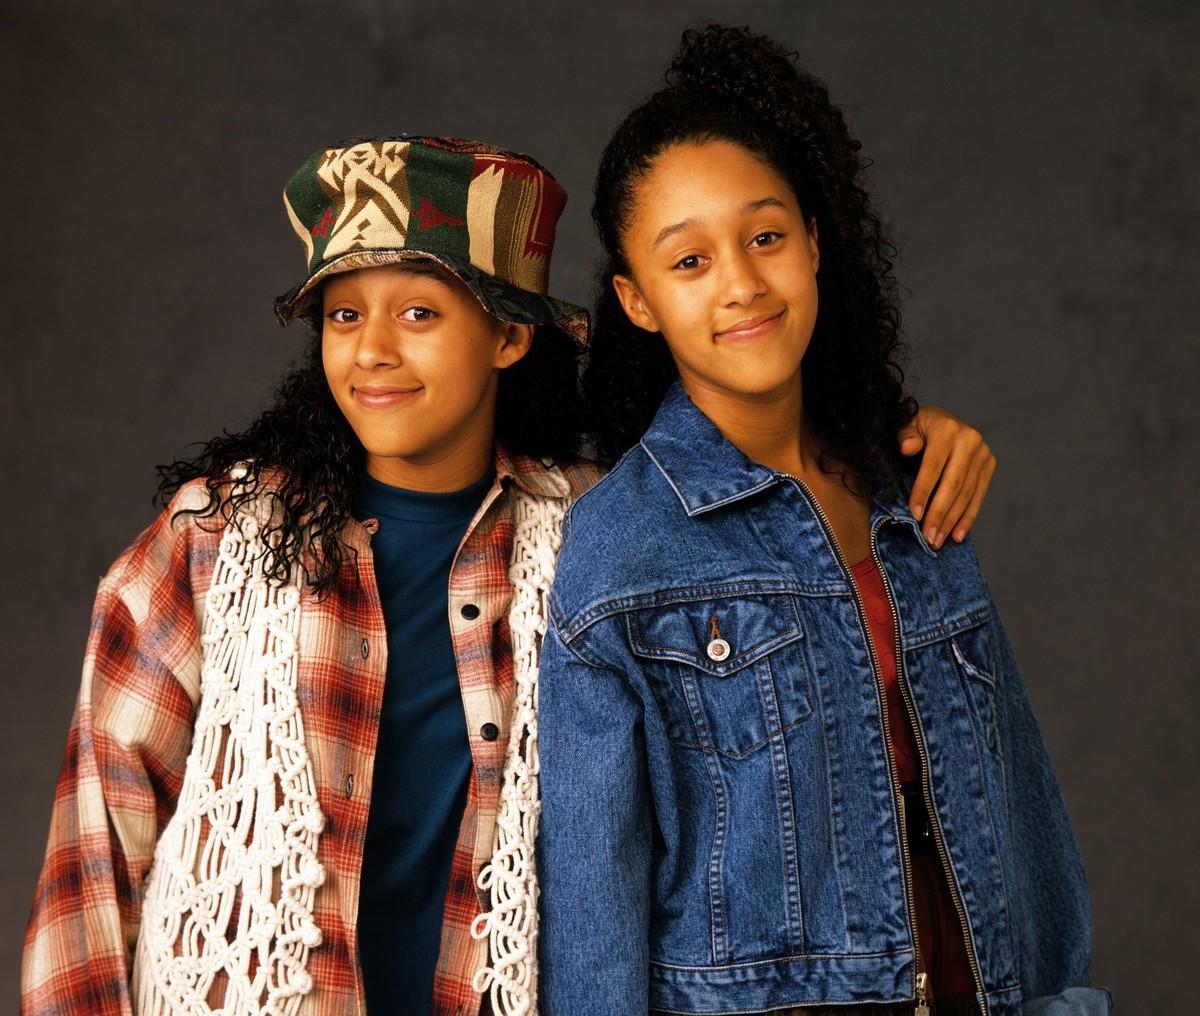 Tia Landry and Tamara Campbell